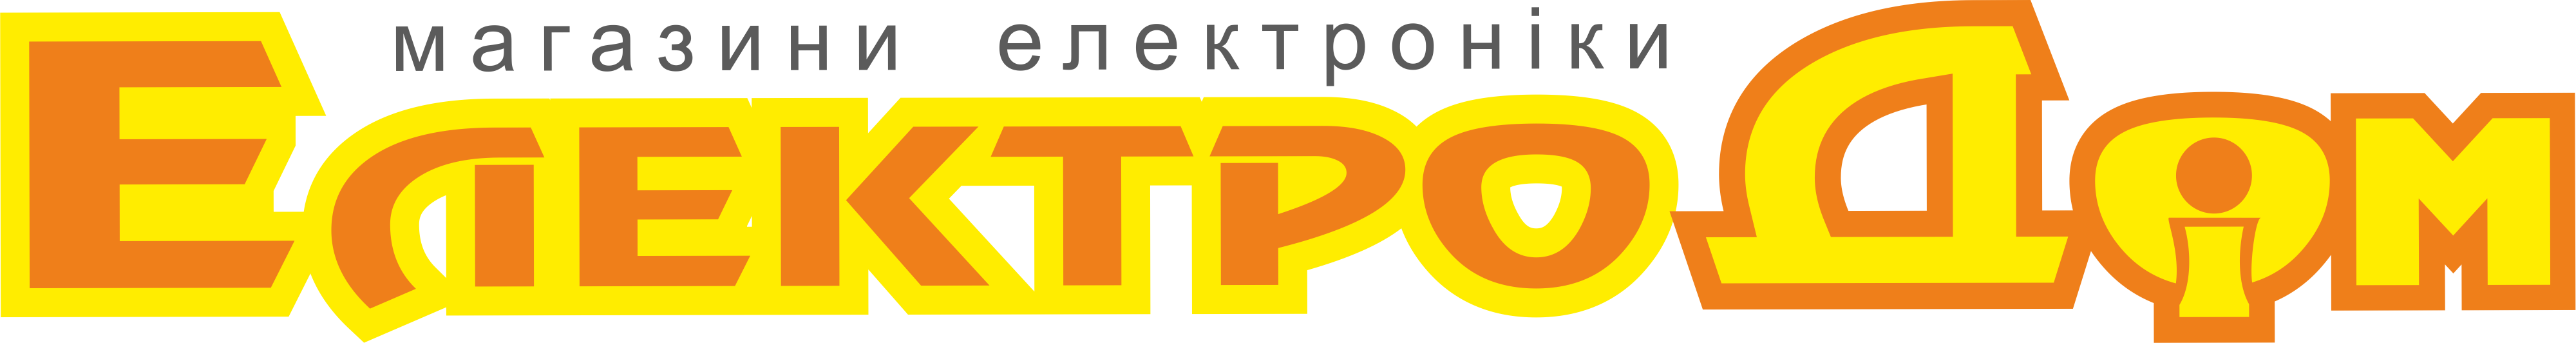 Electrodim.ua